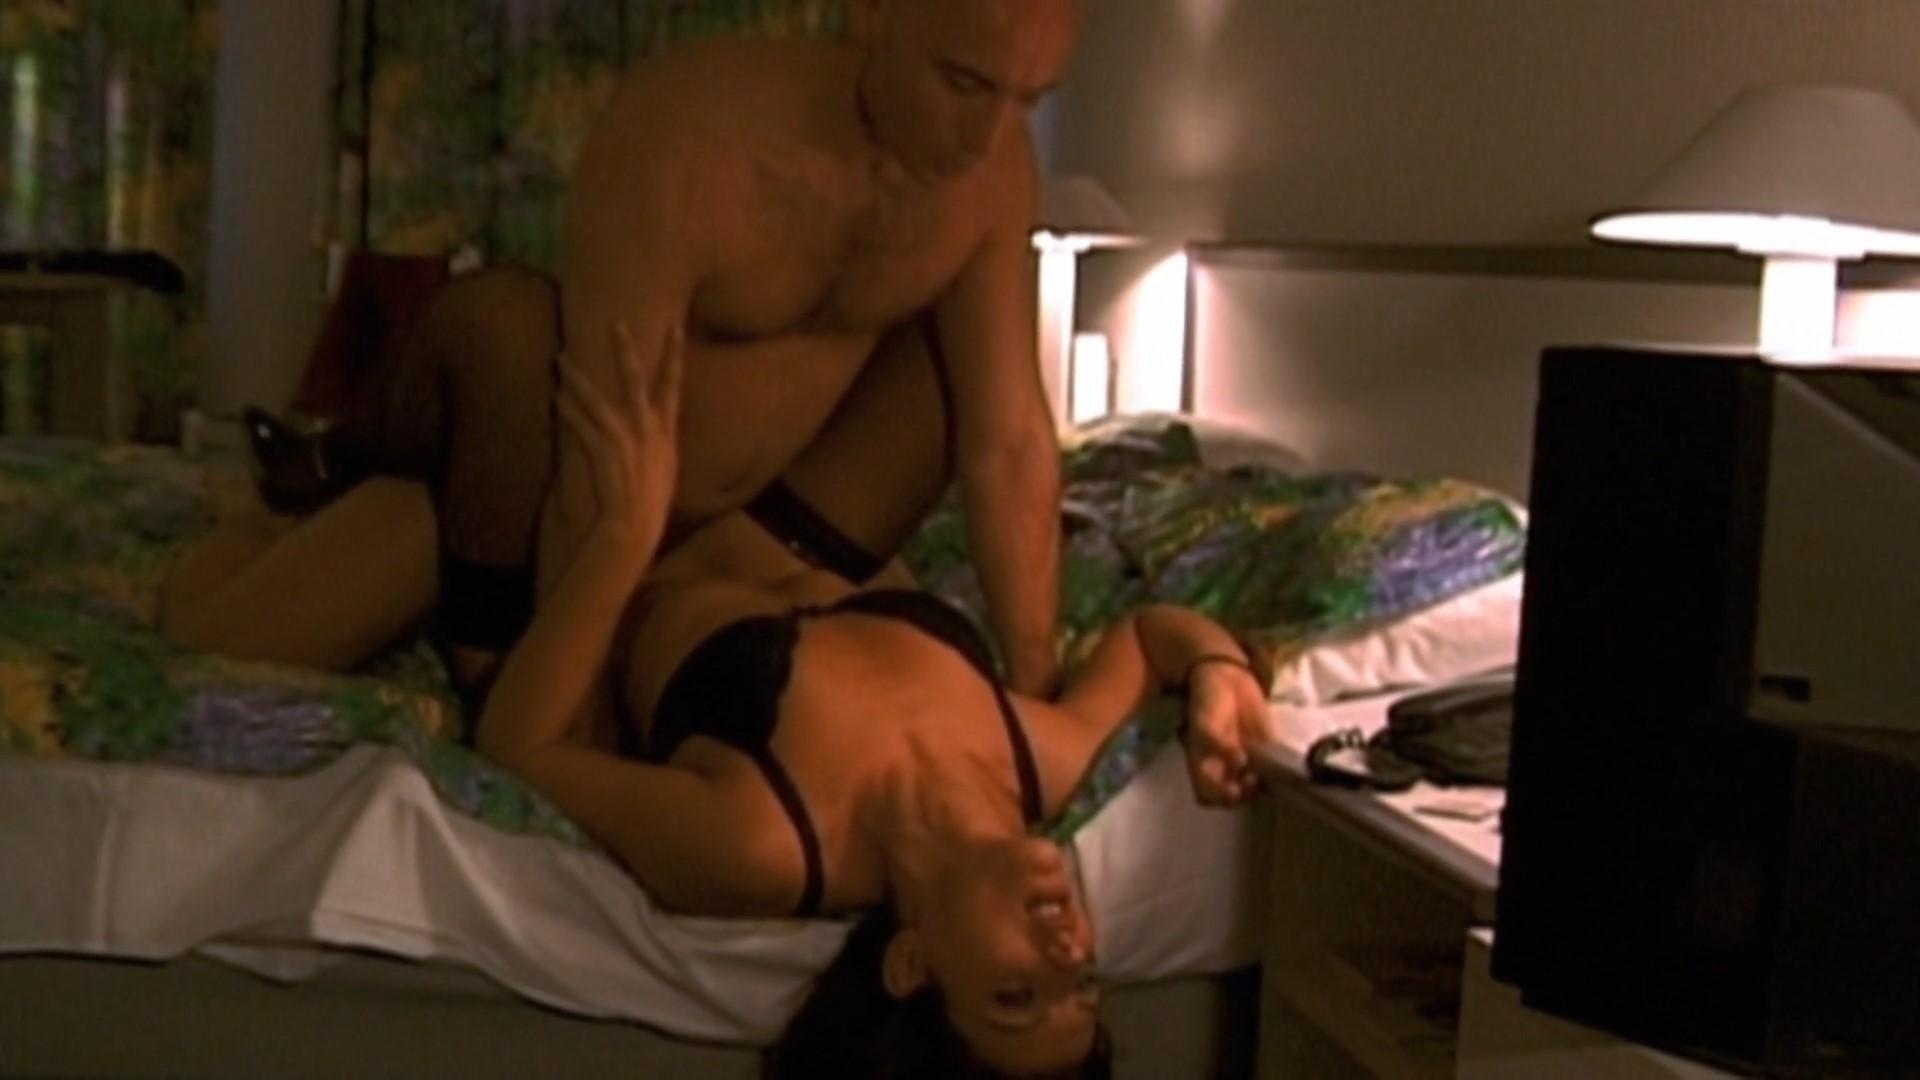 Baise Moi Explicit watch online - karen lancaume, etc – baise moi (2000) hd 1080p